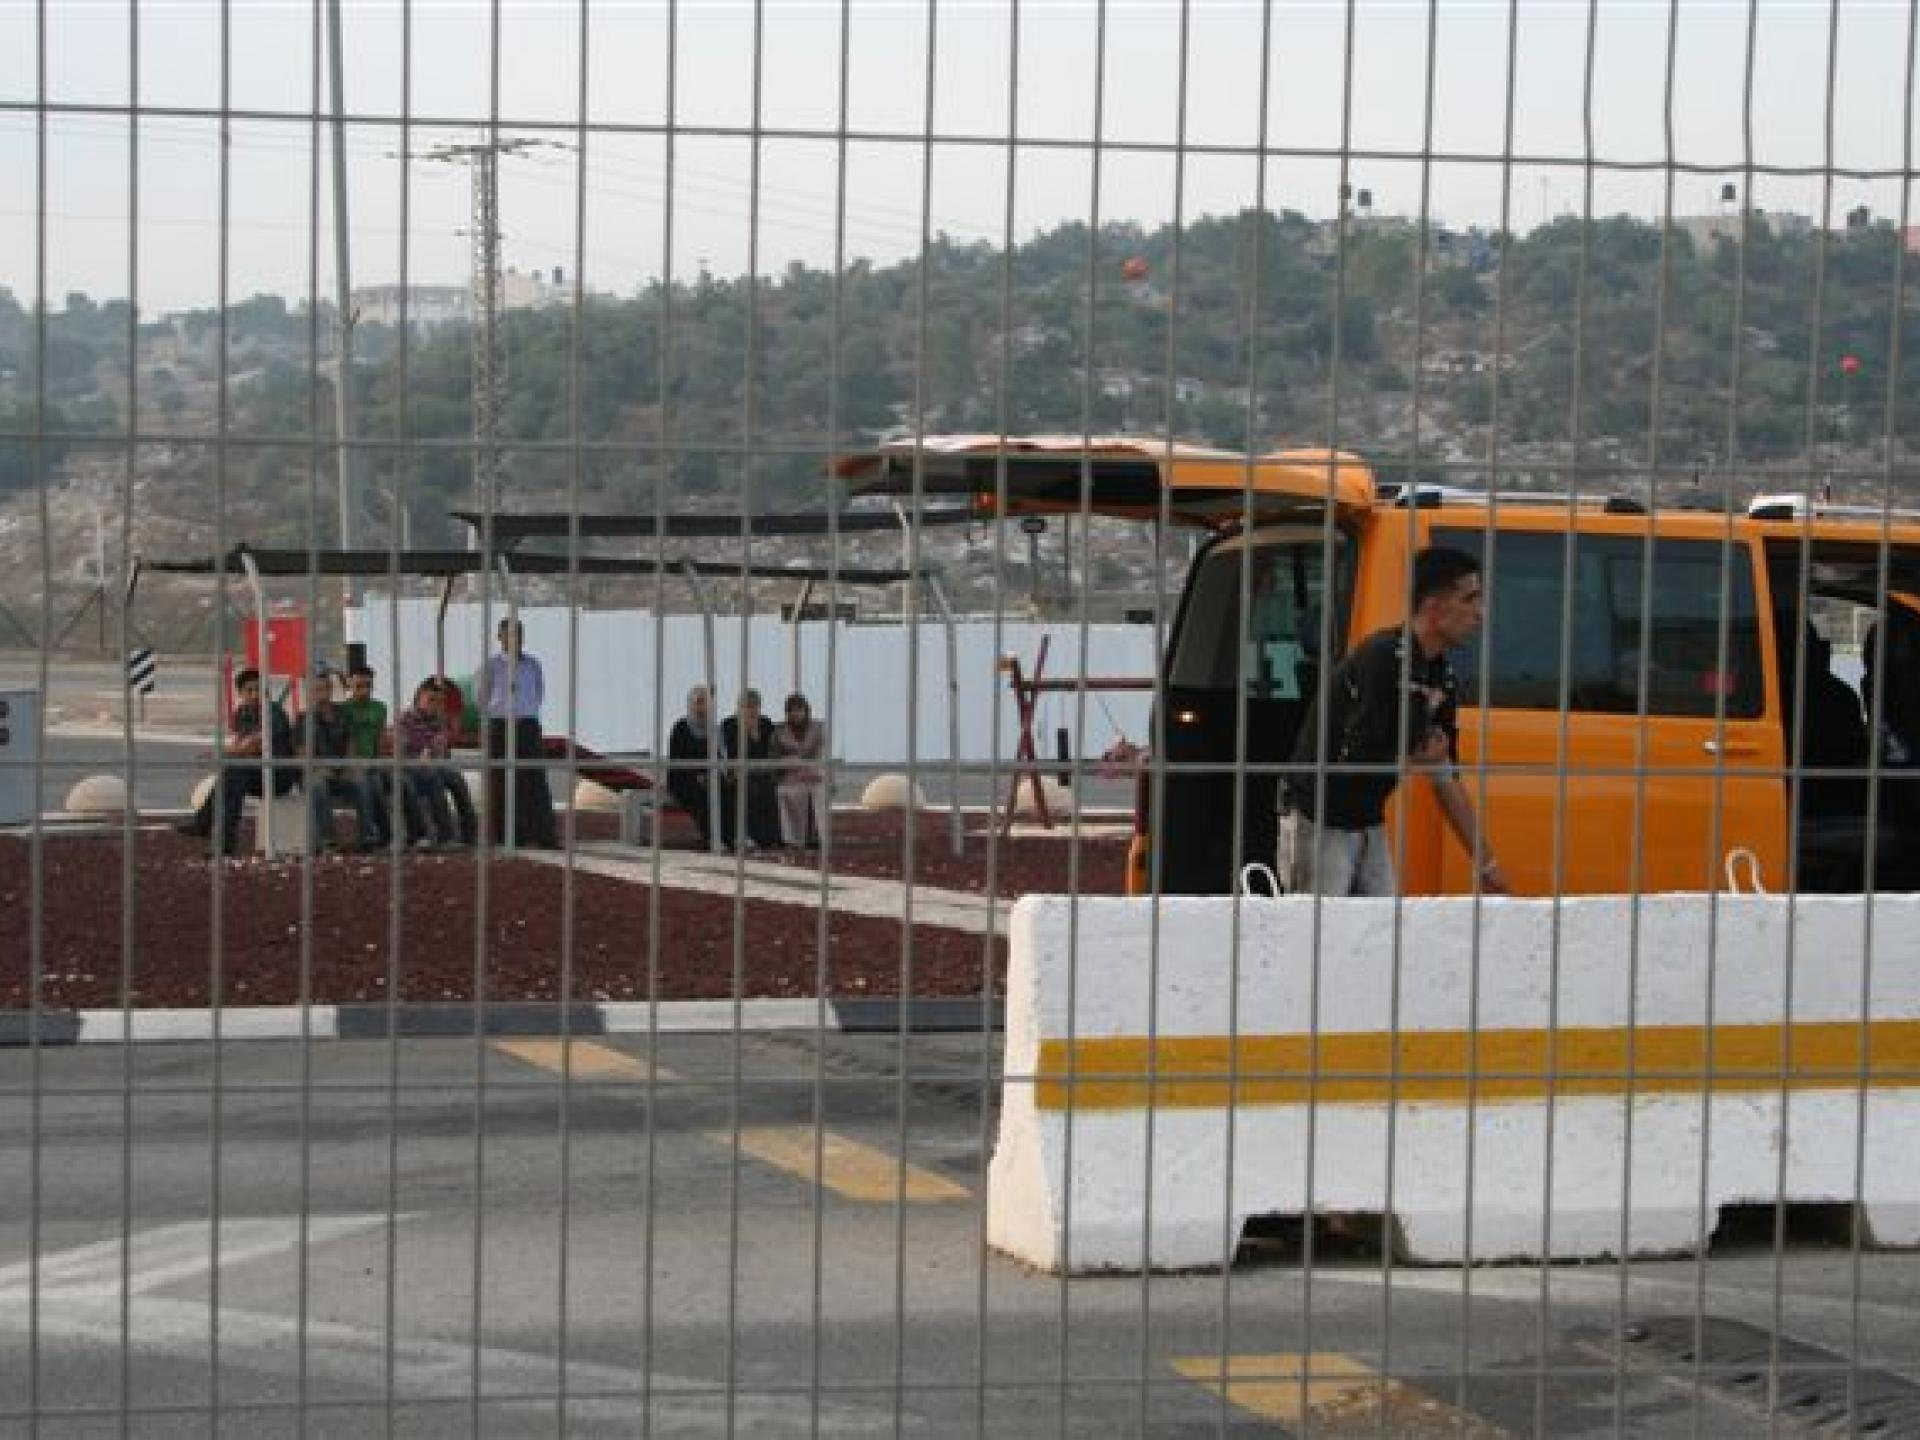 Barta'a/Reikhan checkpoint 13.07.08